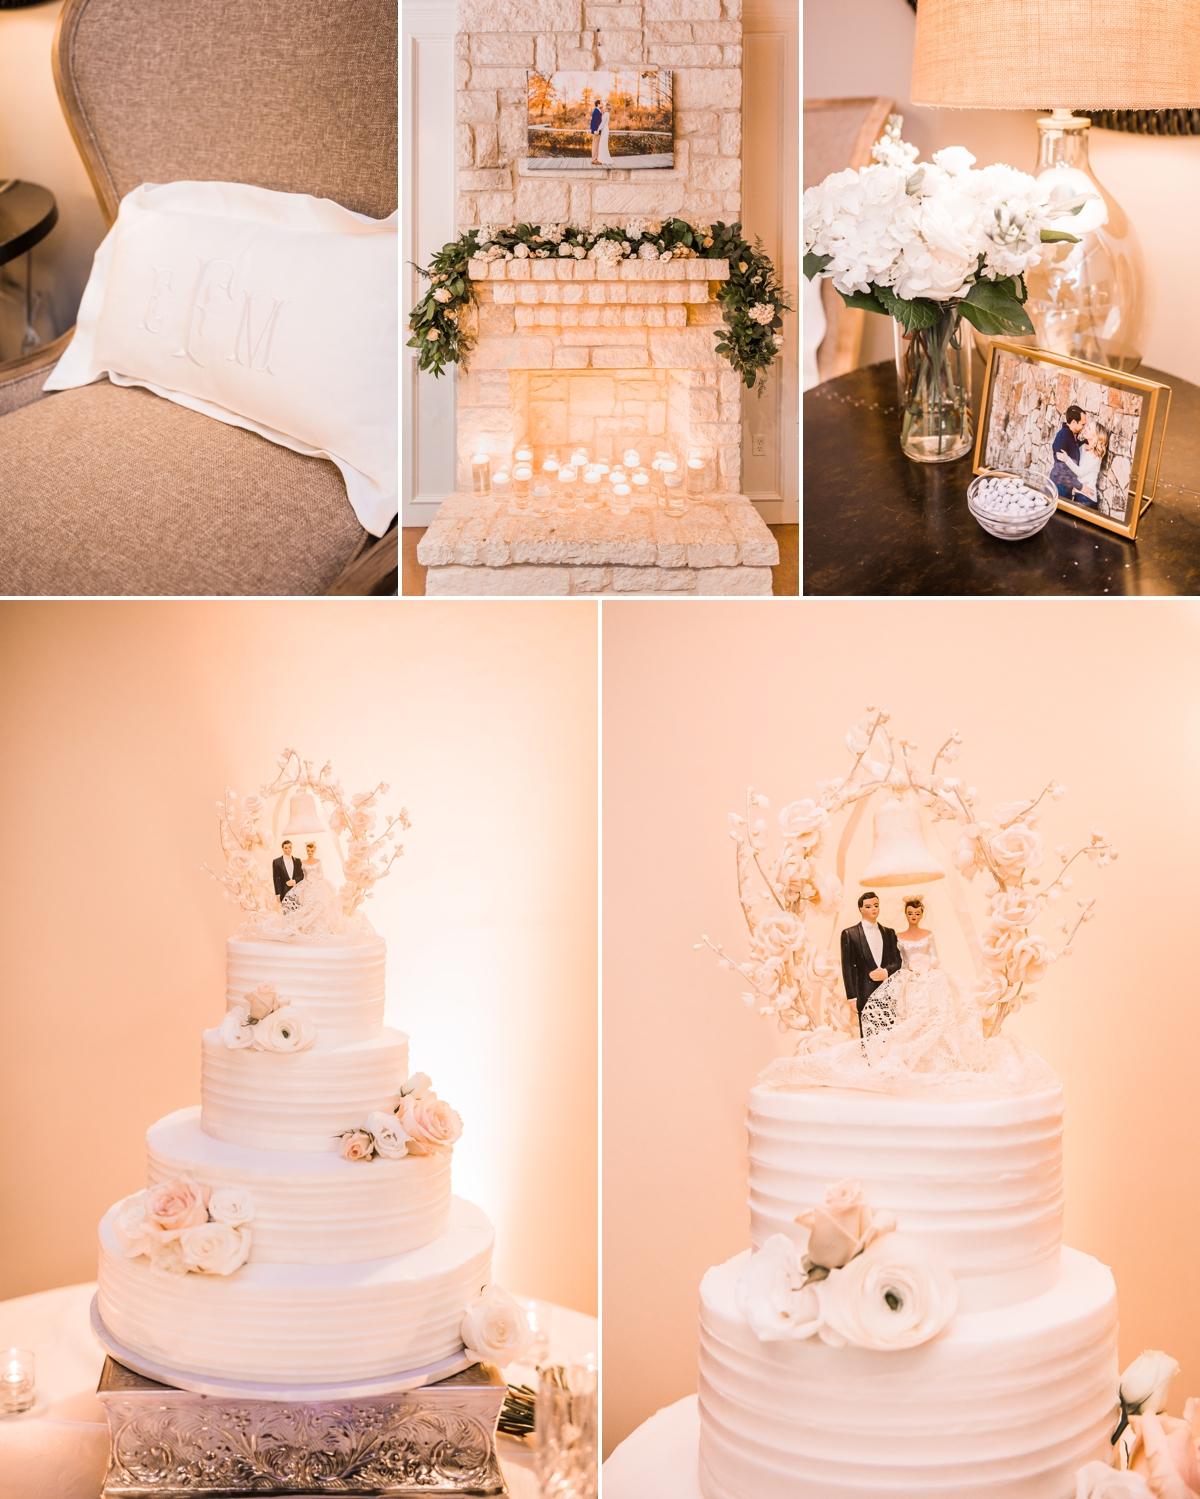 Monochromatic Cream and Blush wedding details at Briscoe Manor Wedding